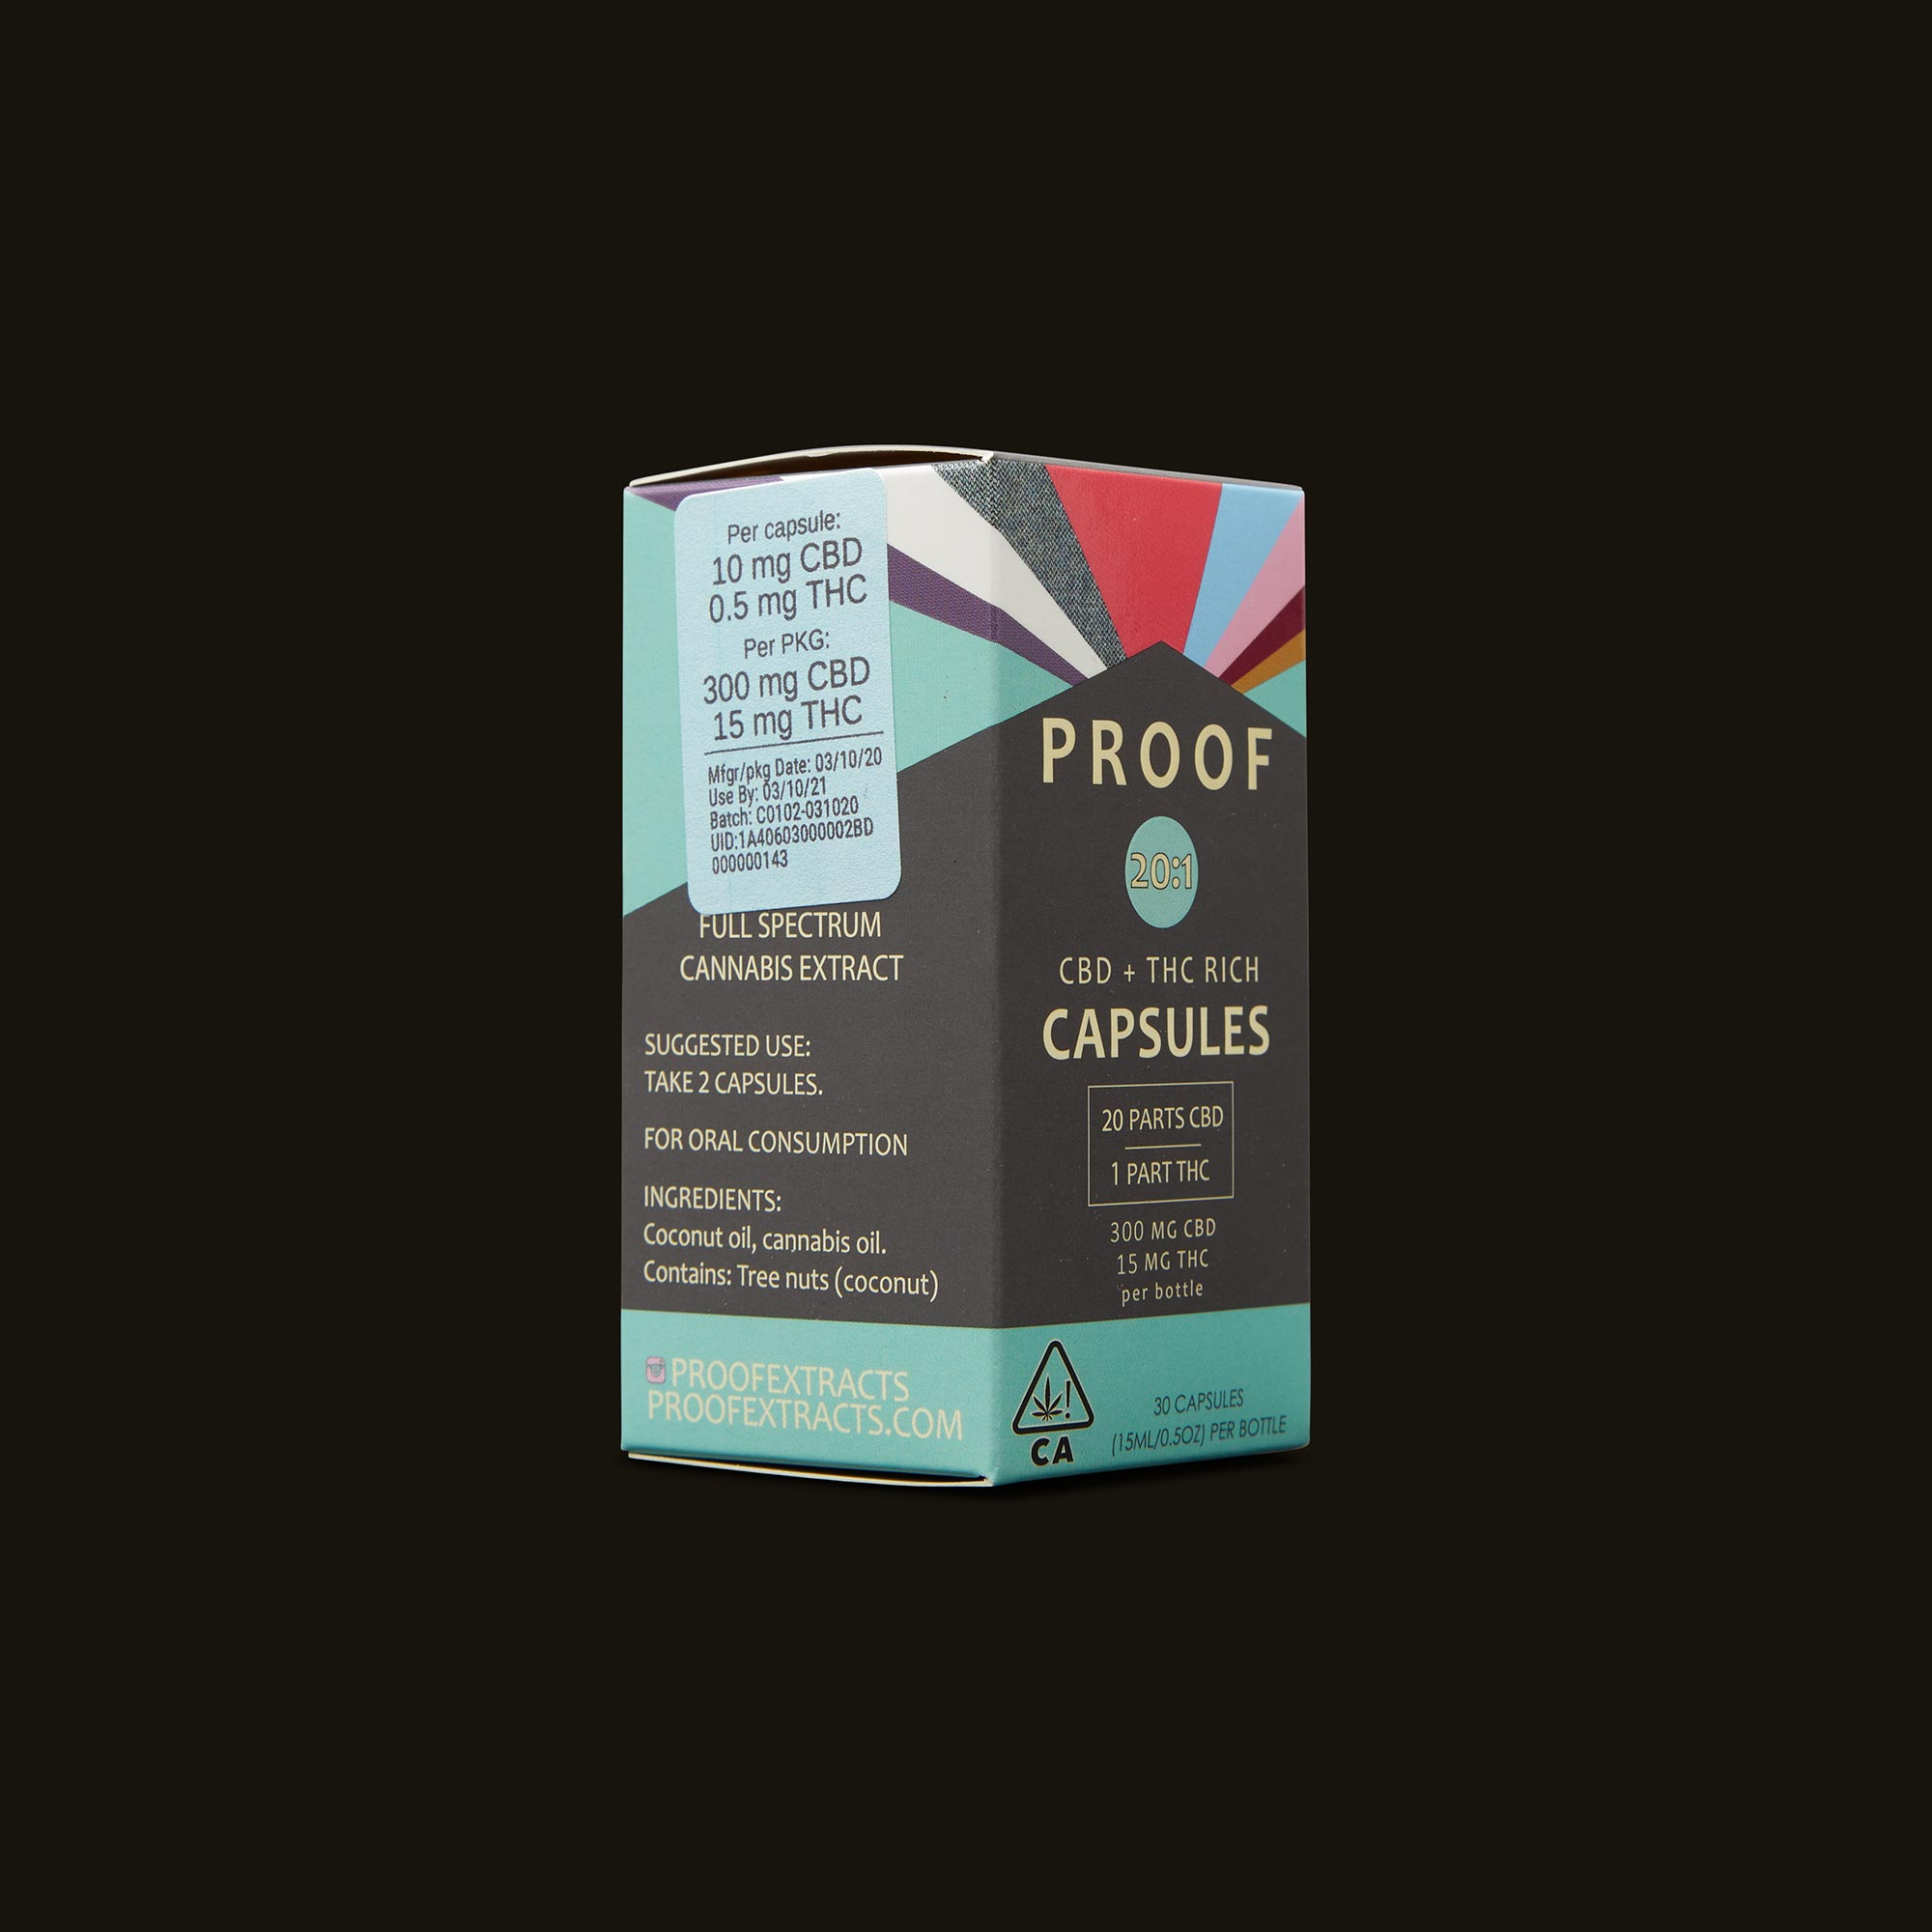 Proof 20:1 CBD:THC Capsules Ingredients